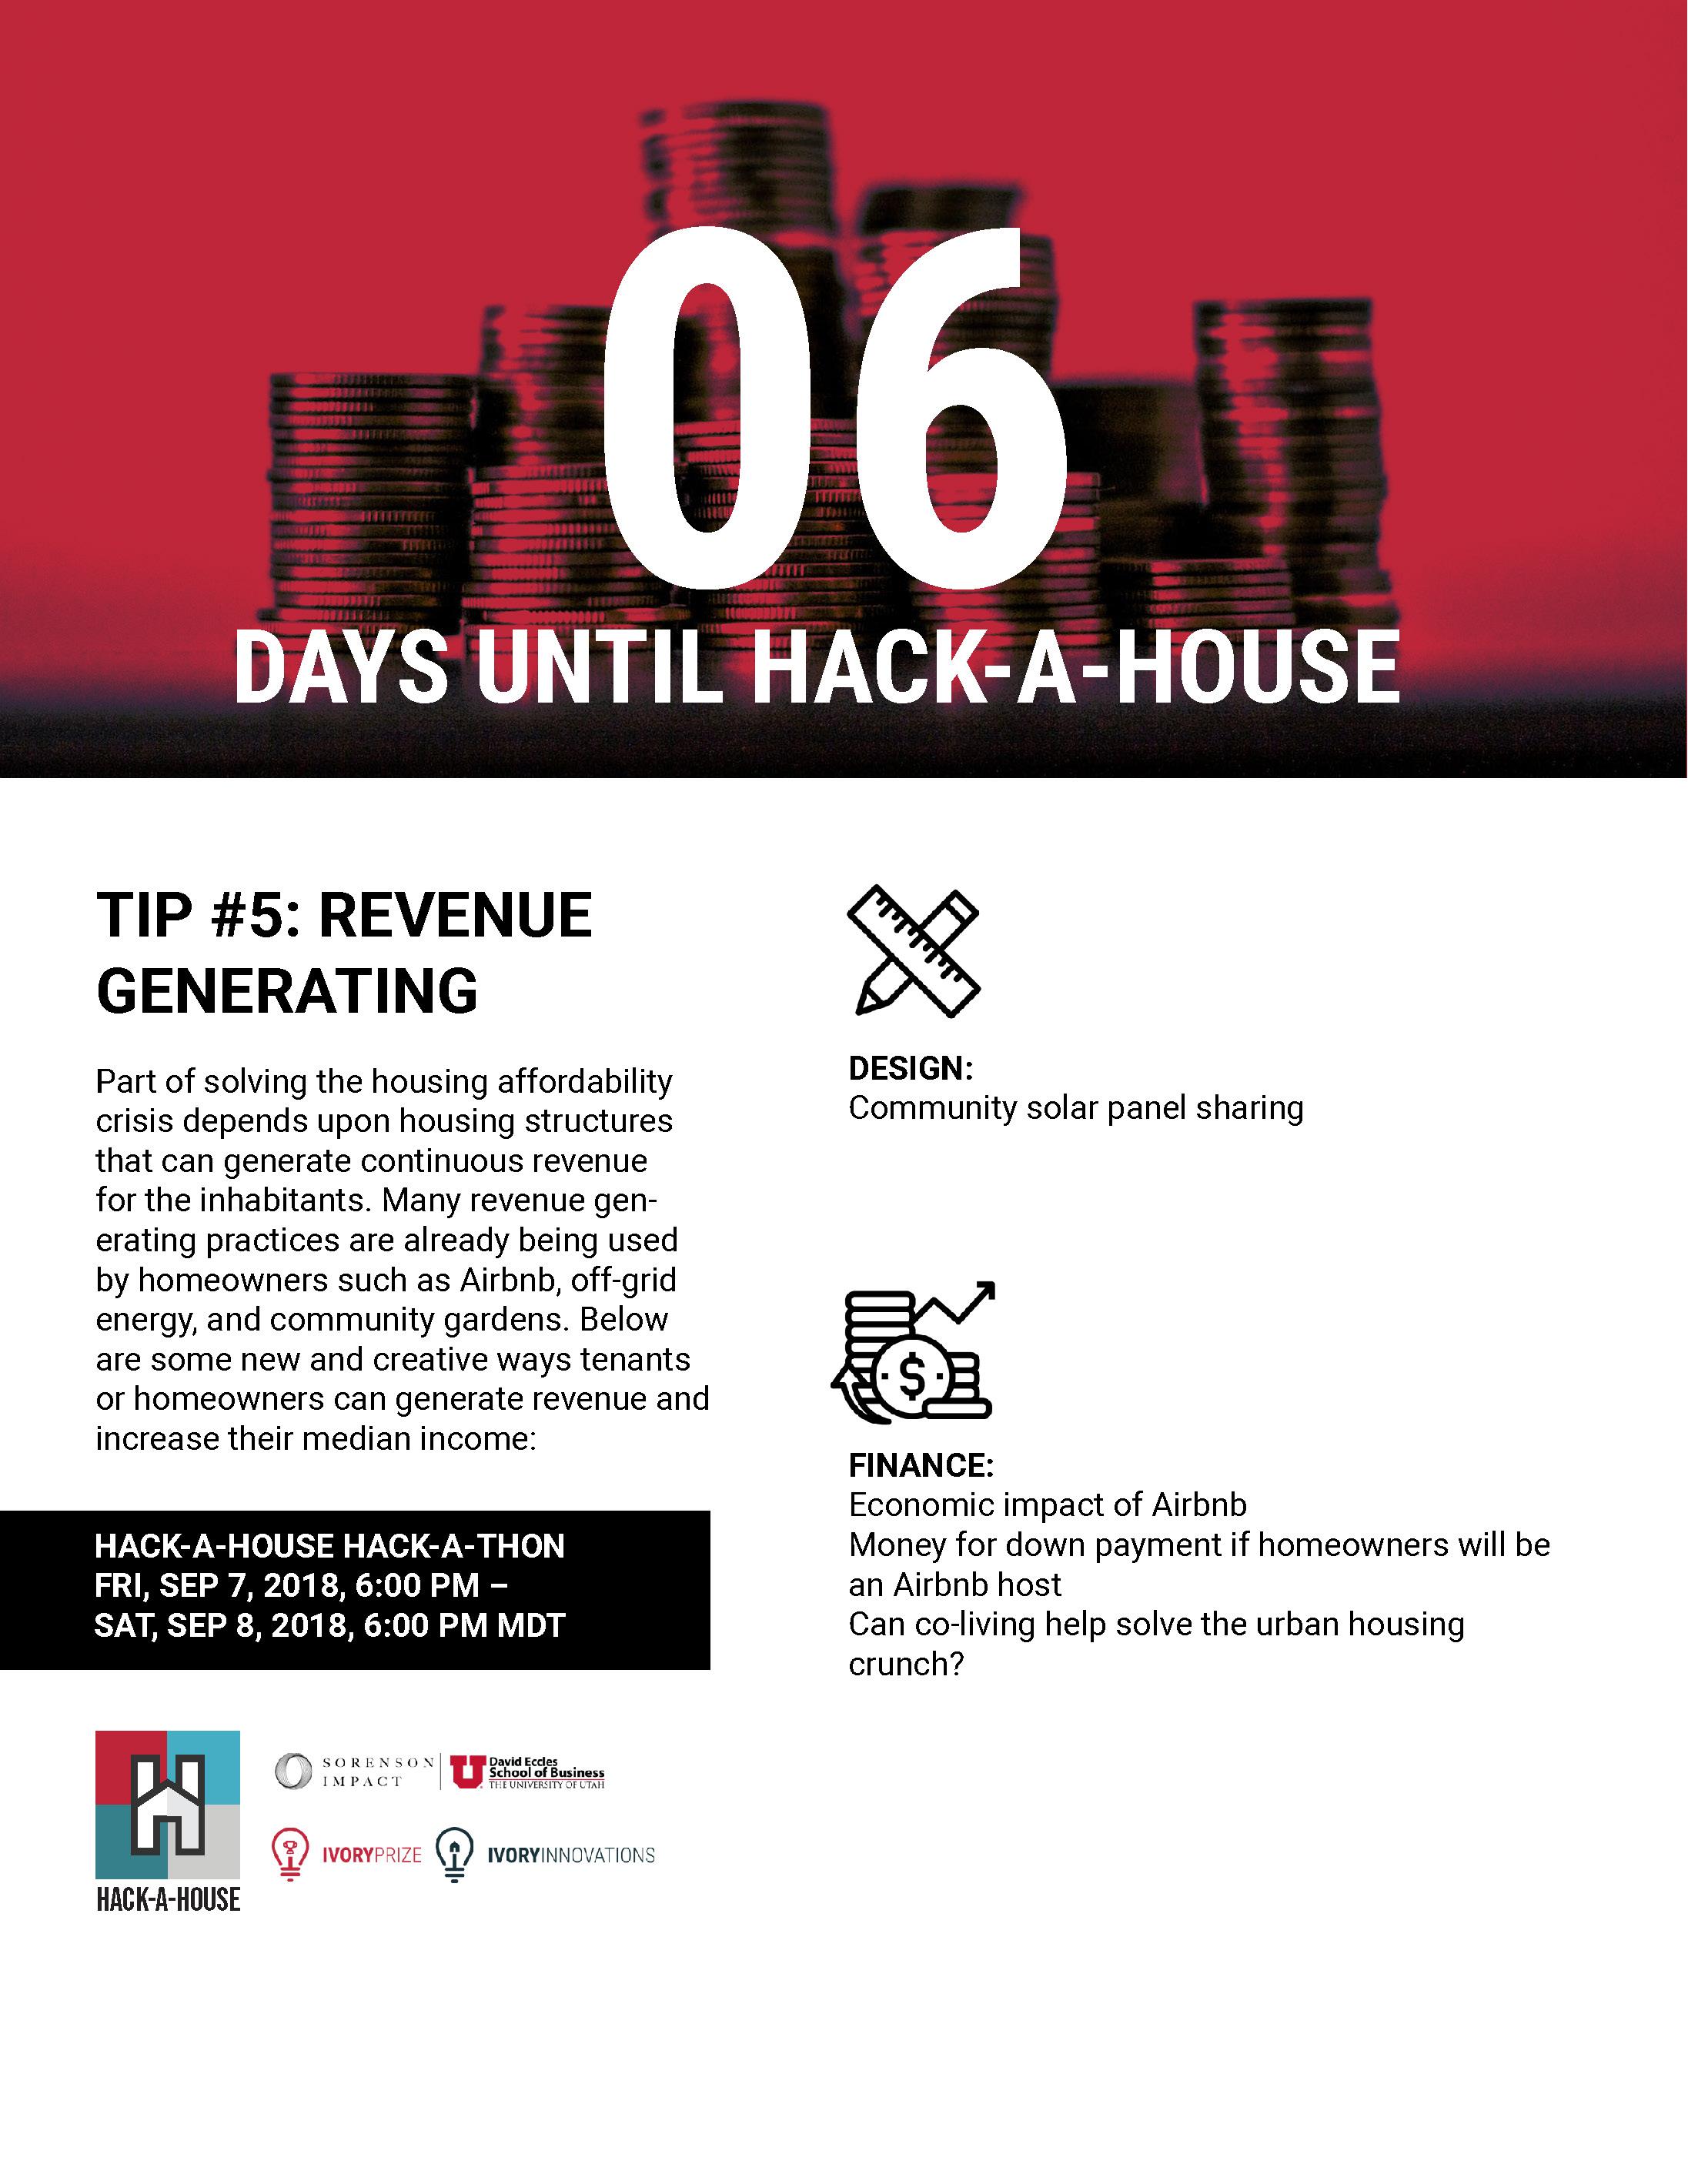 hack-a-house countdown_05.jpg